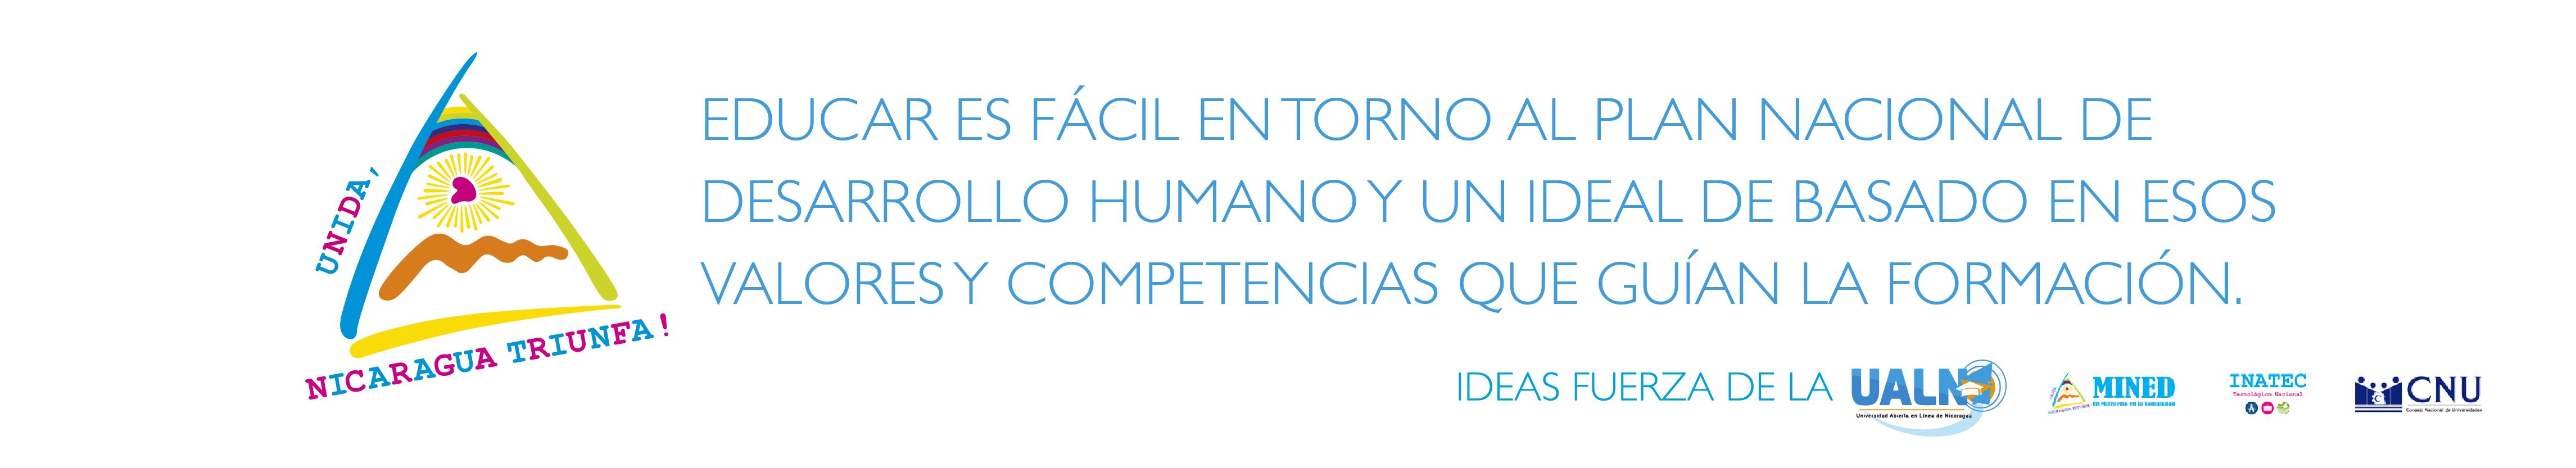 idea12-01